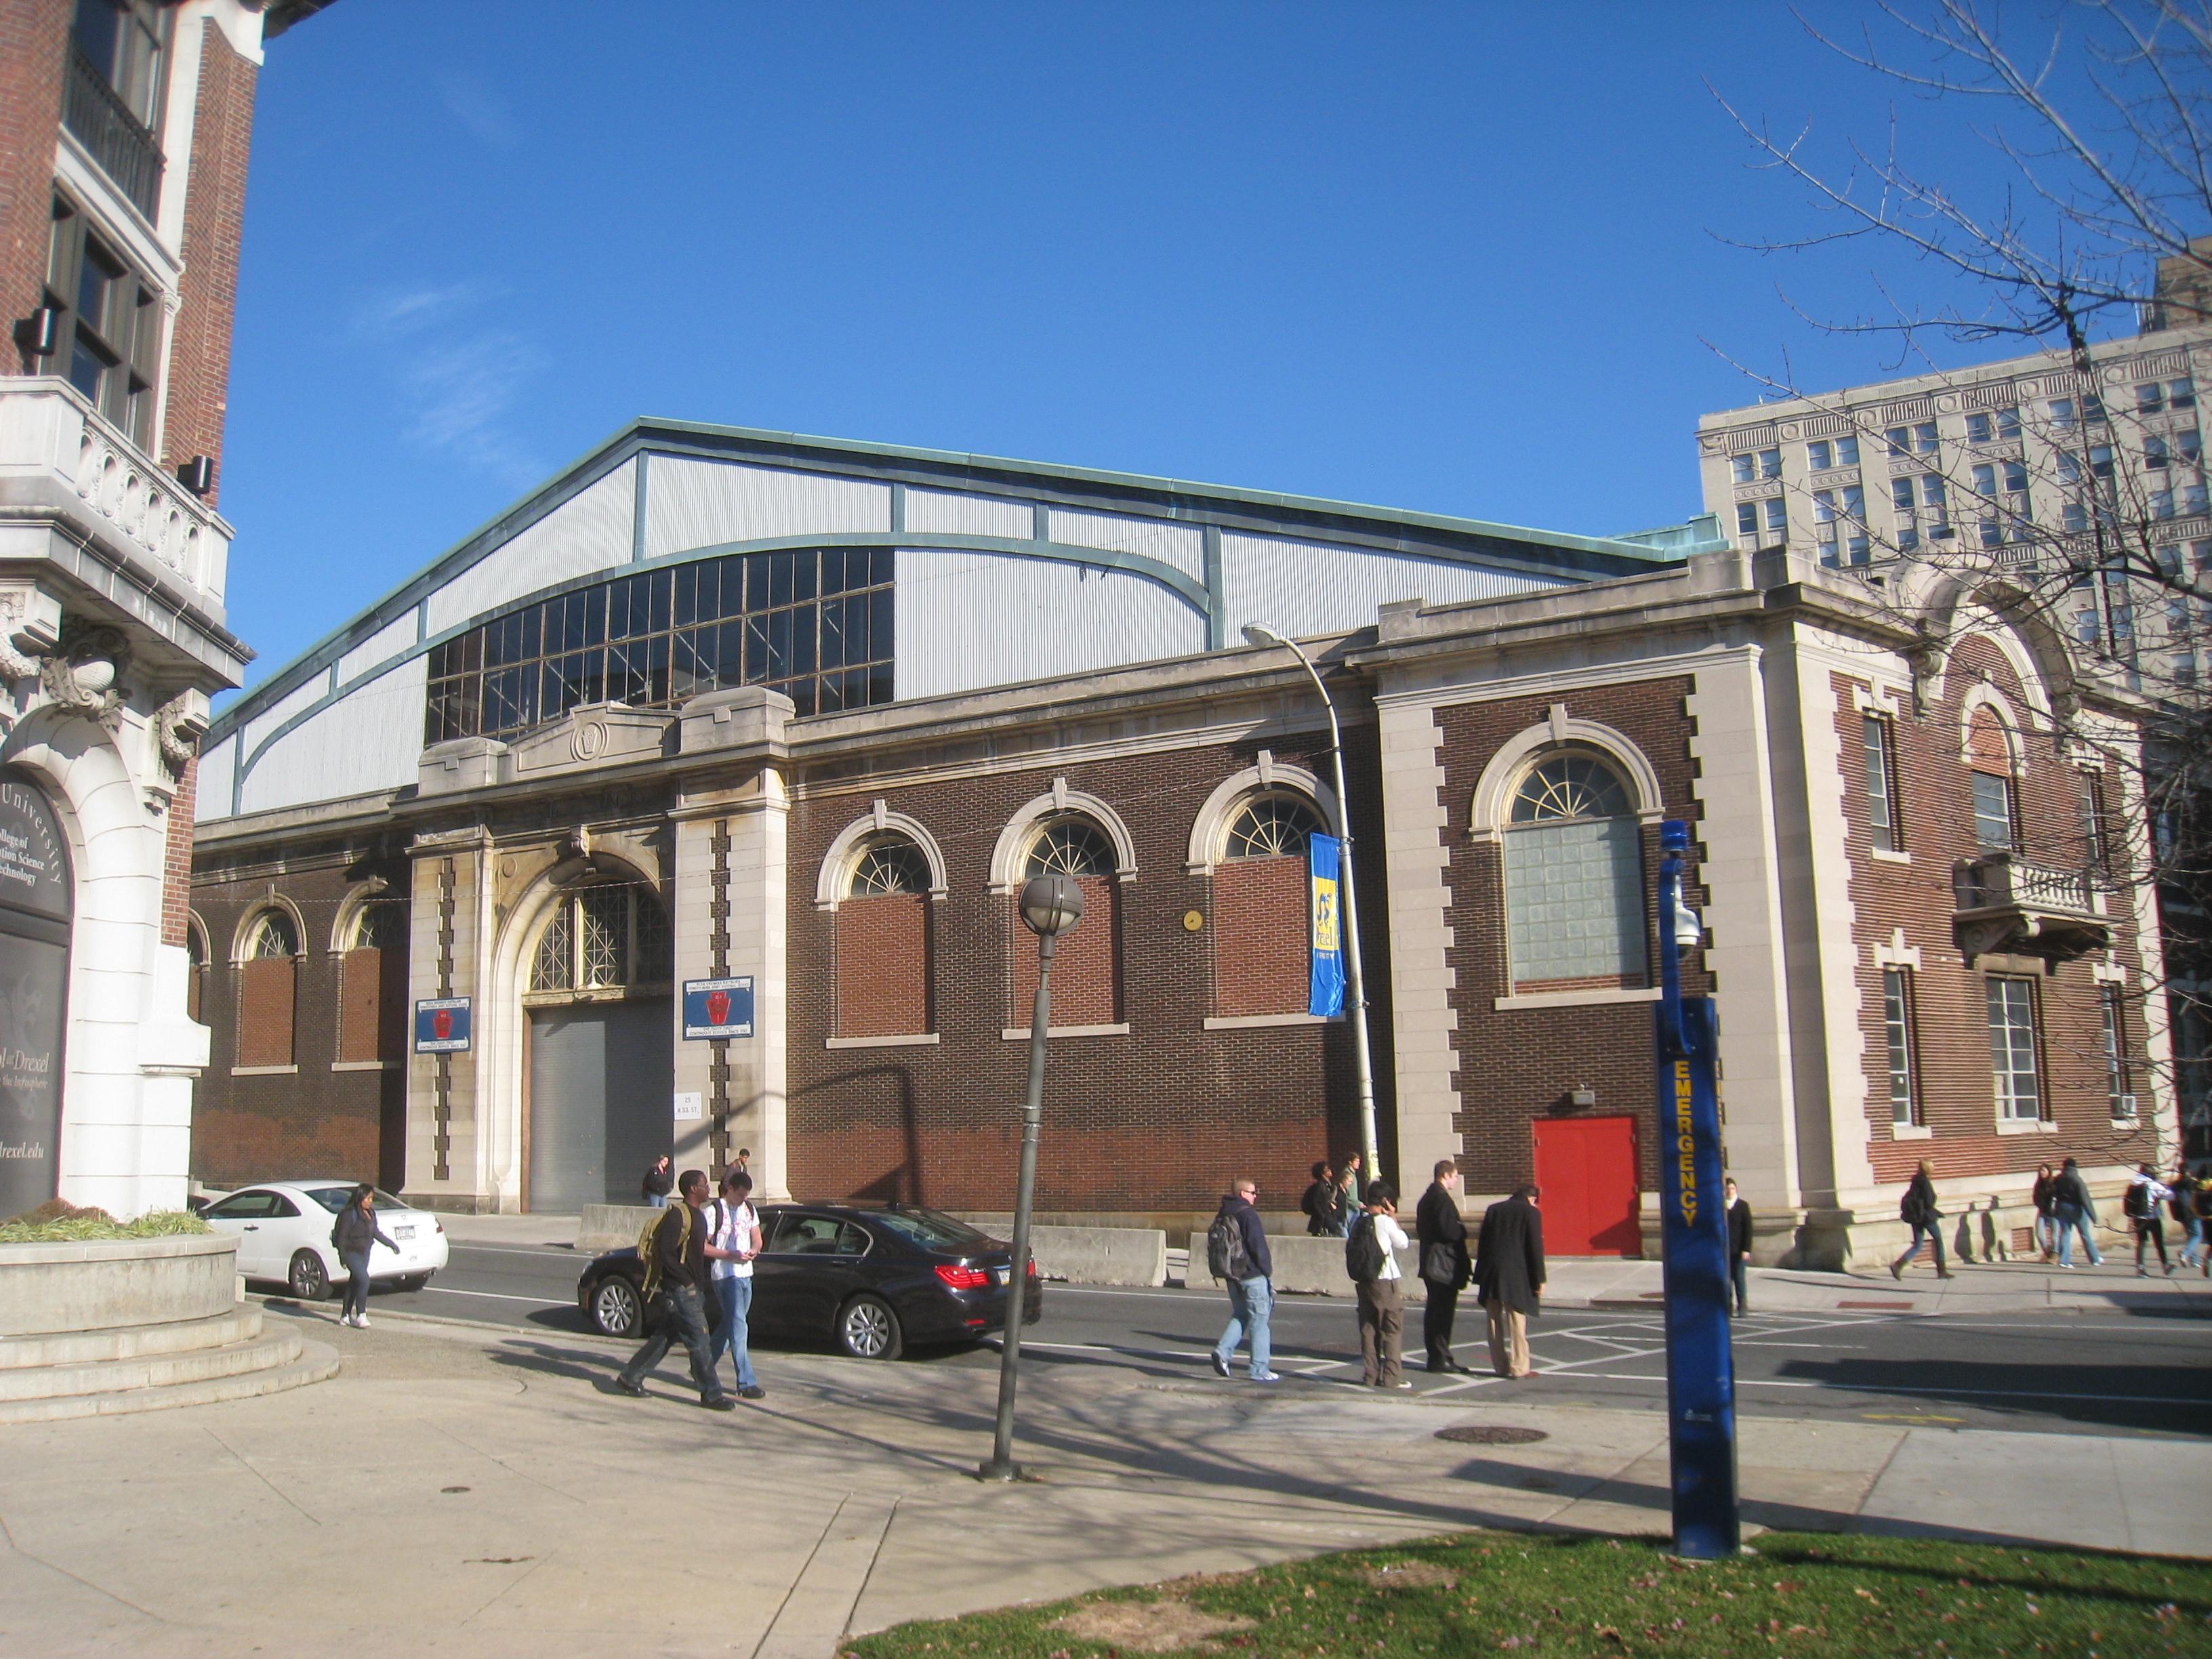 filearmory drexel university img 7305 jpg wikimedia commons